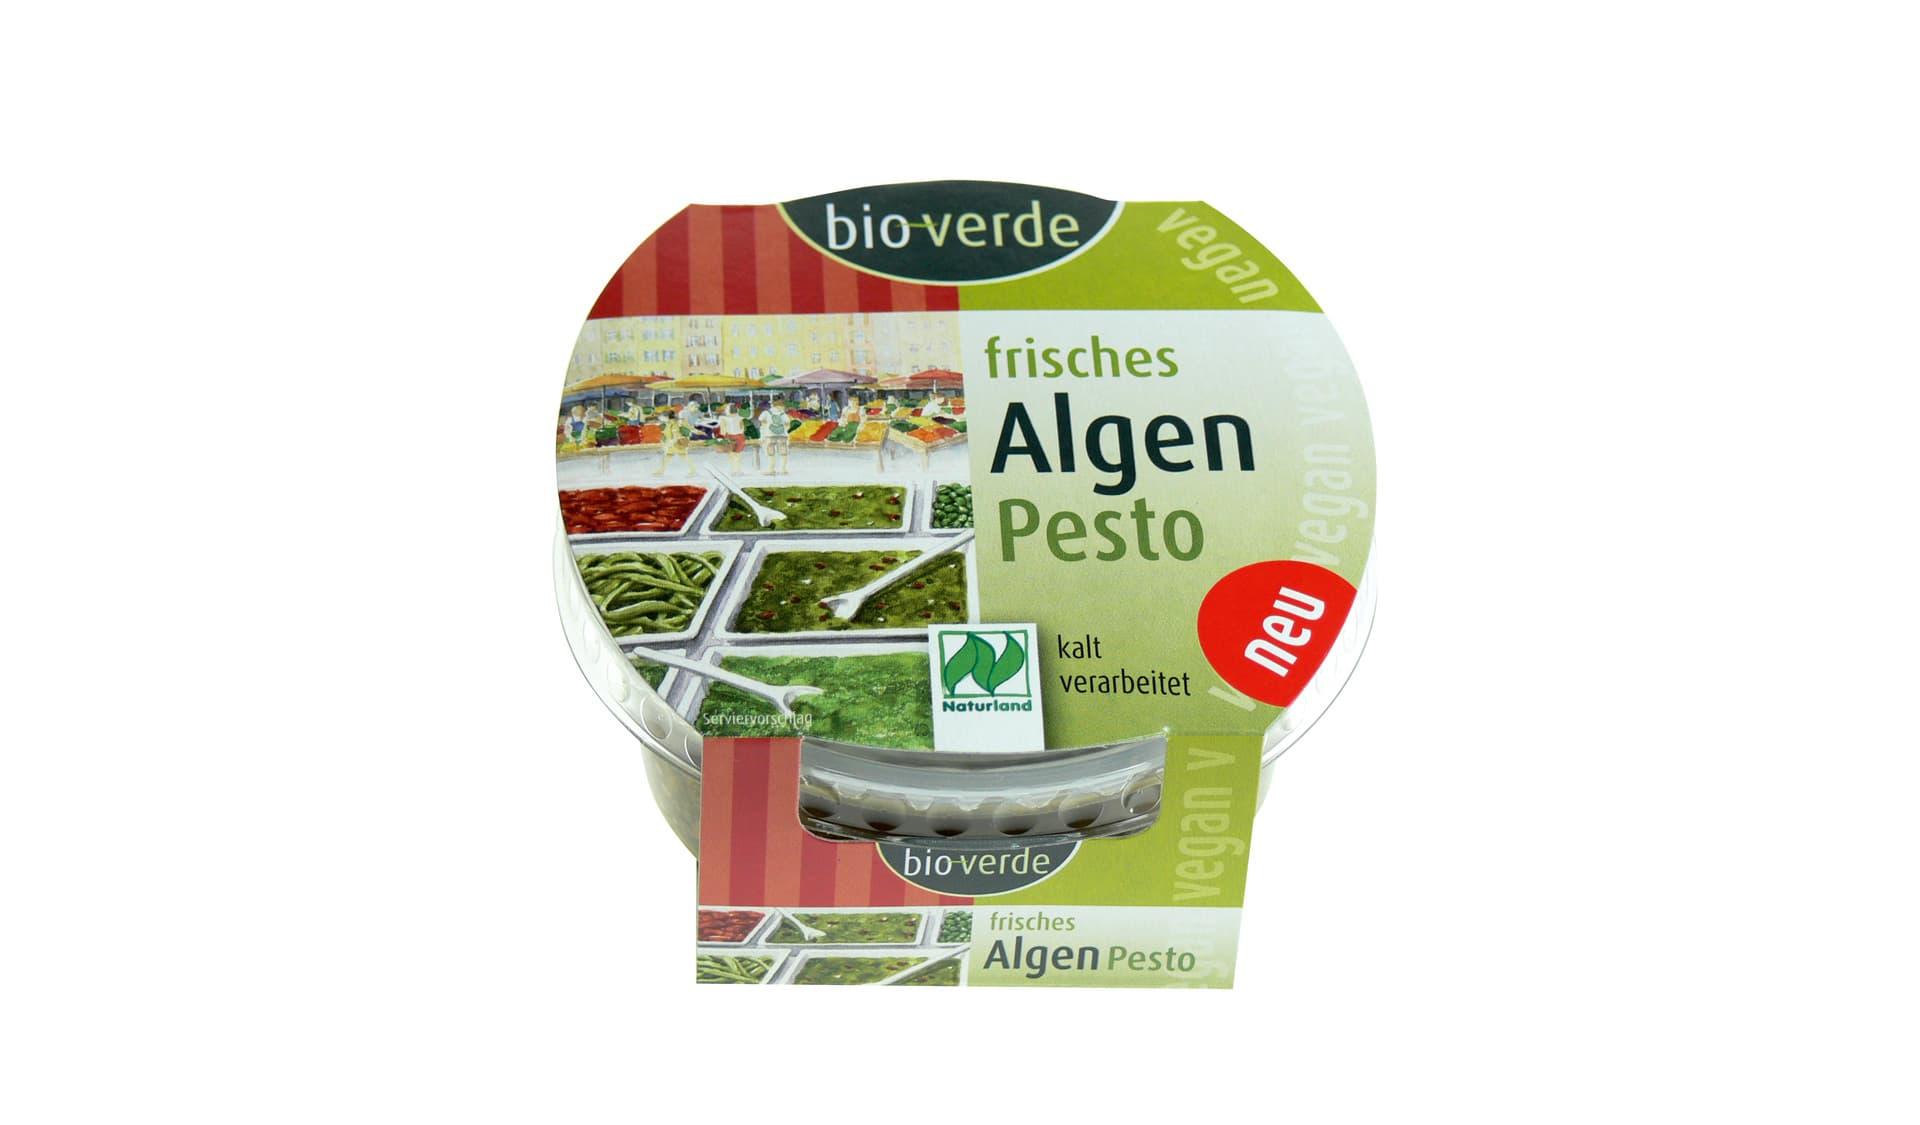 Isana/Bio Verde (www.bio-verde.de) Frisches Algen Pesto